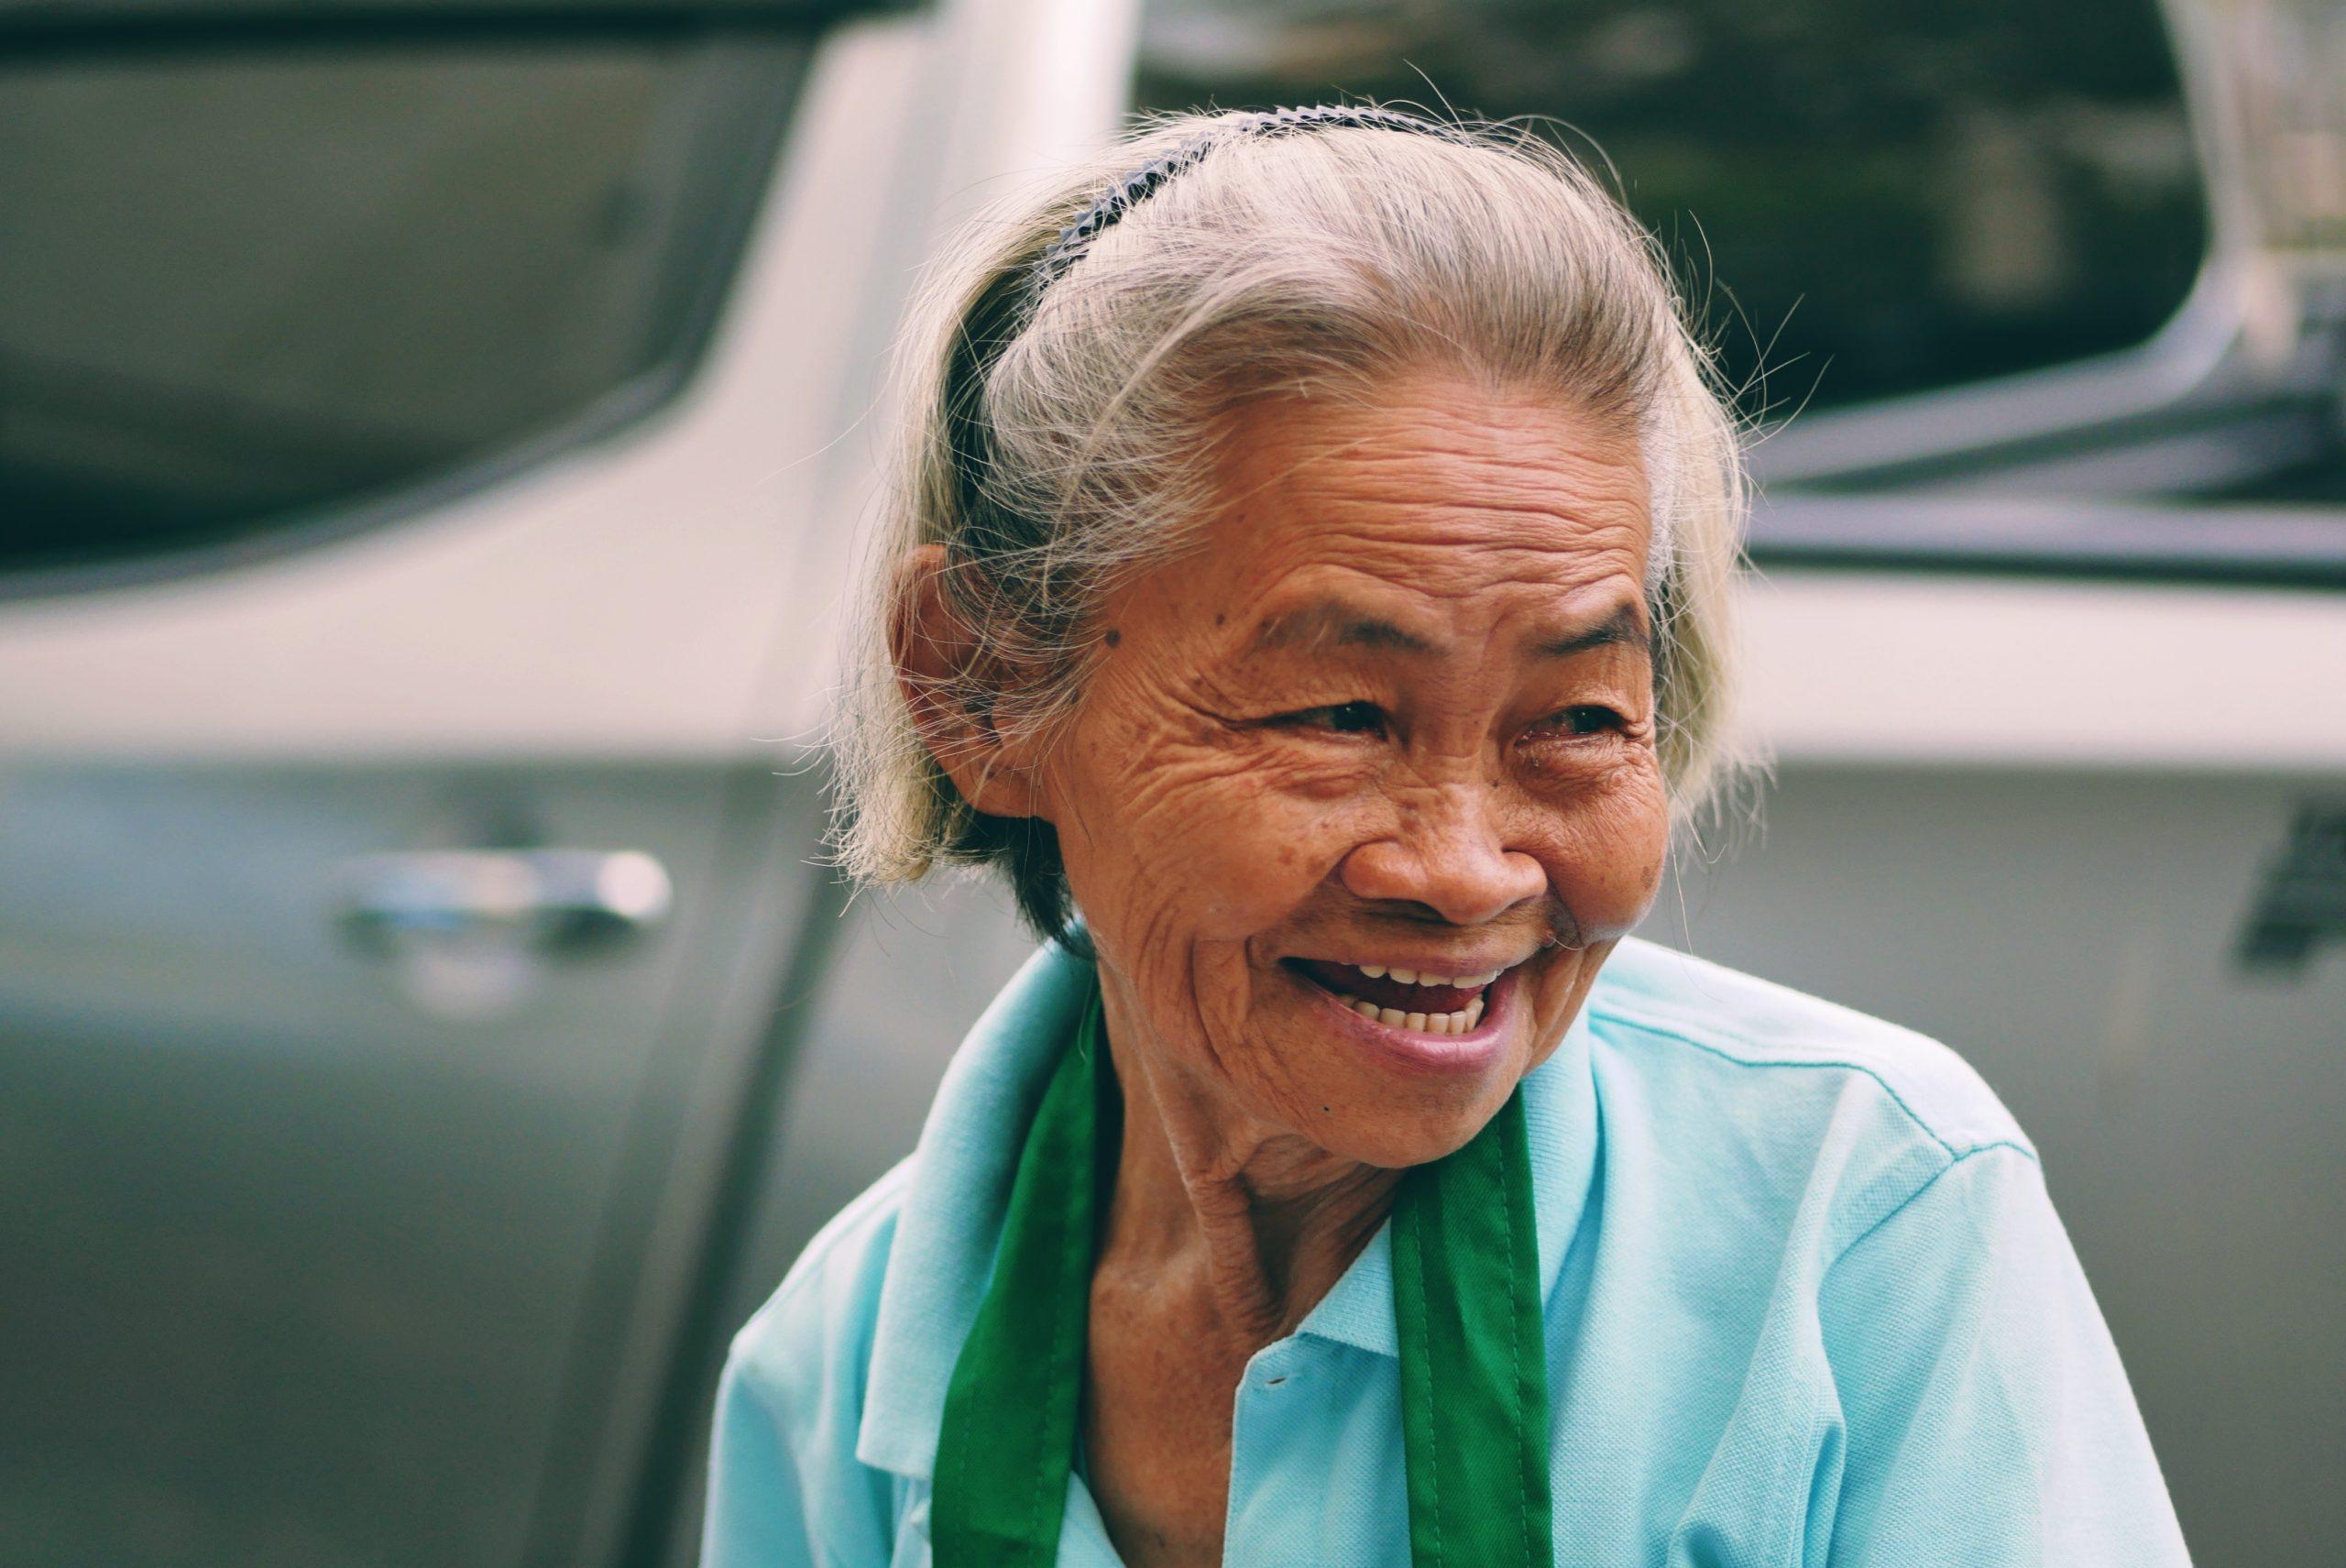 People of Bangkok, Thailand